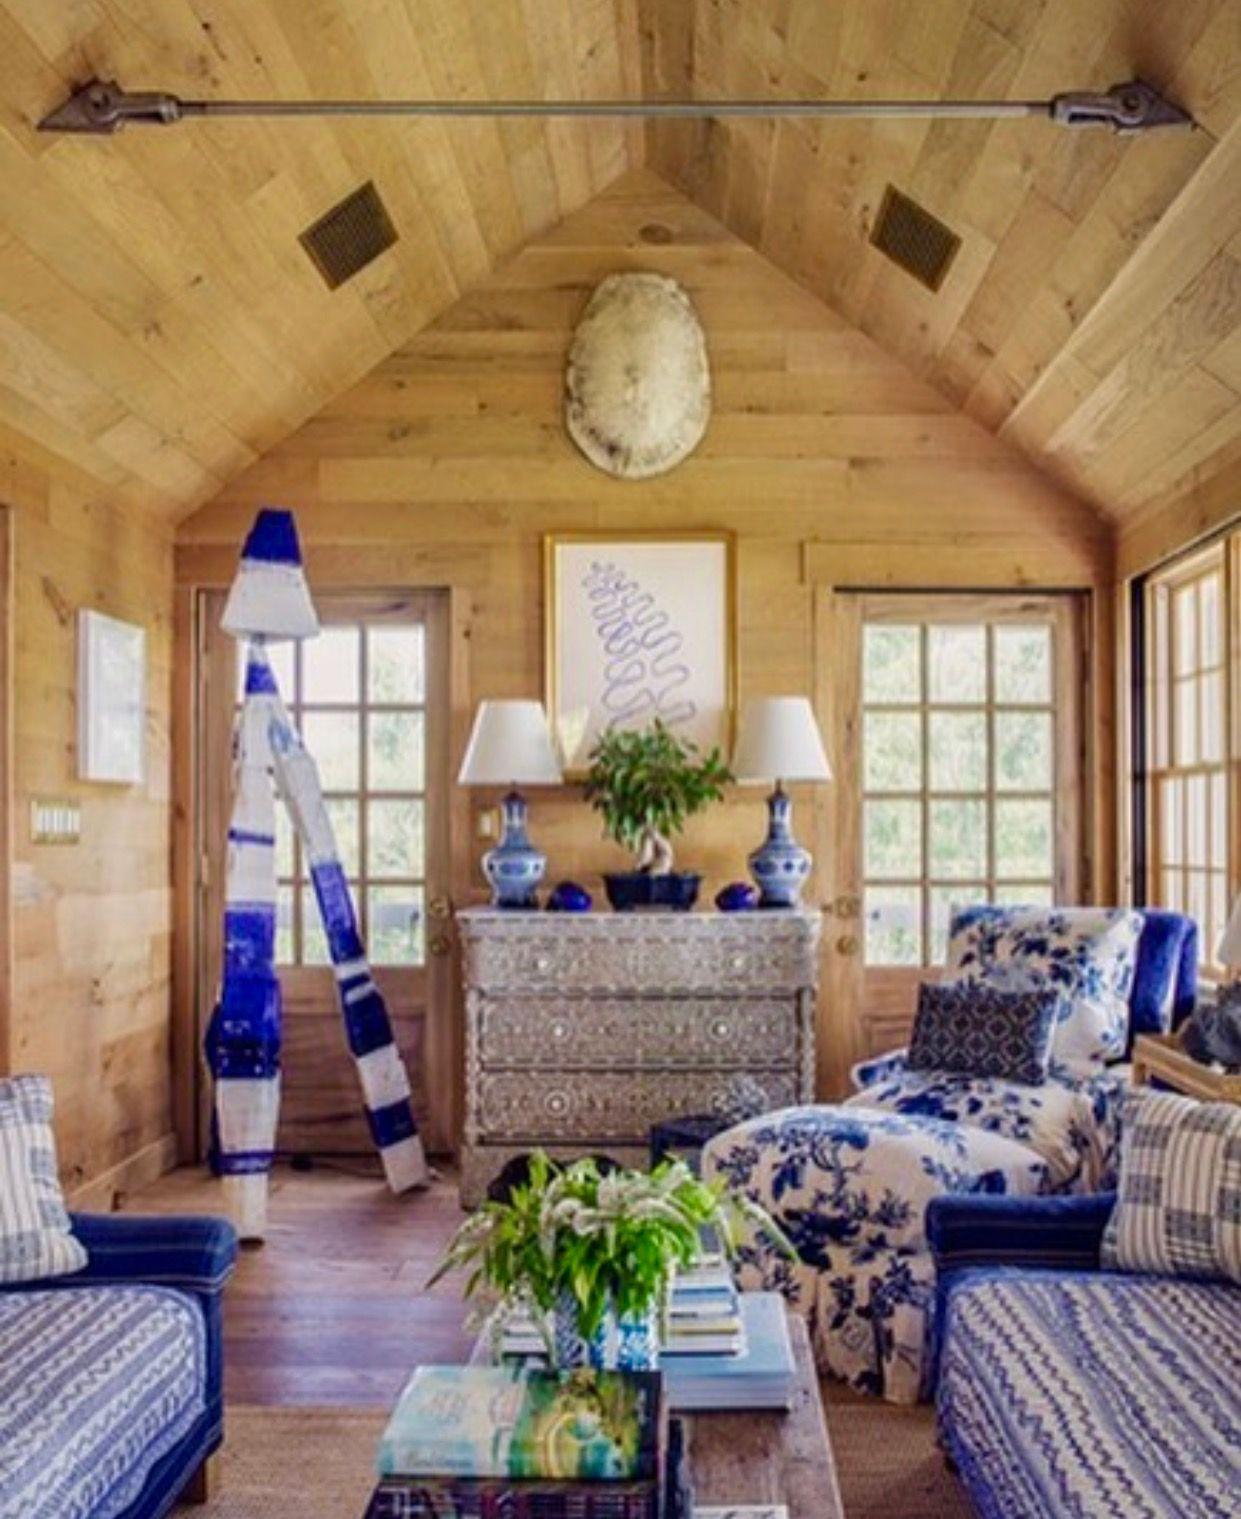 Amazing ski lodge Lake cabin interiors, Design, Interior